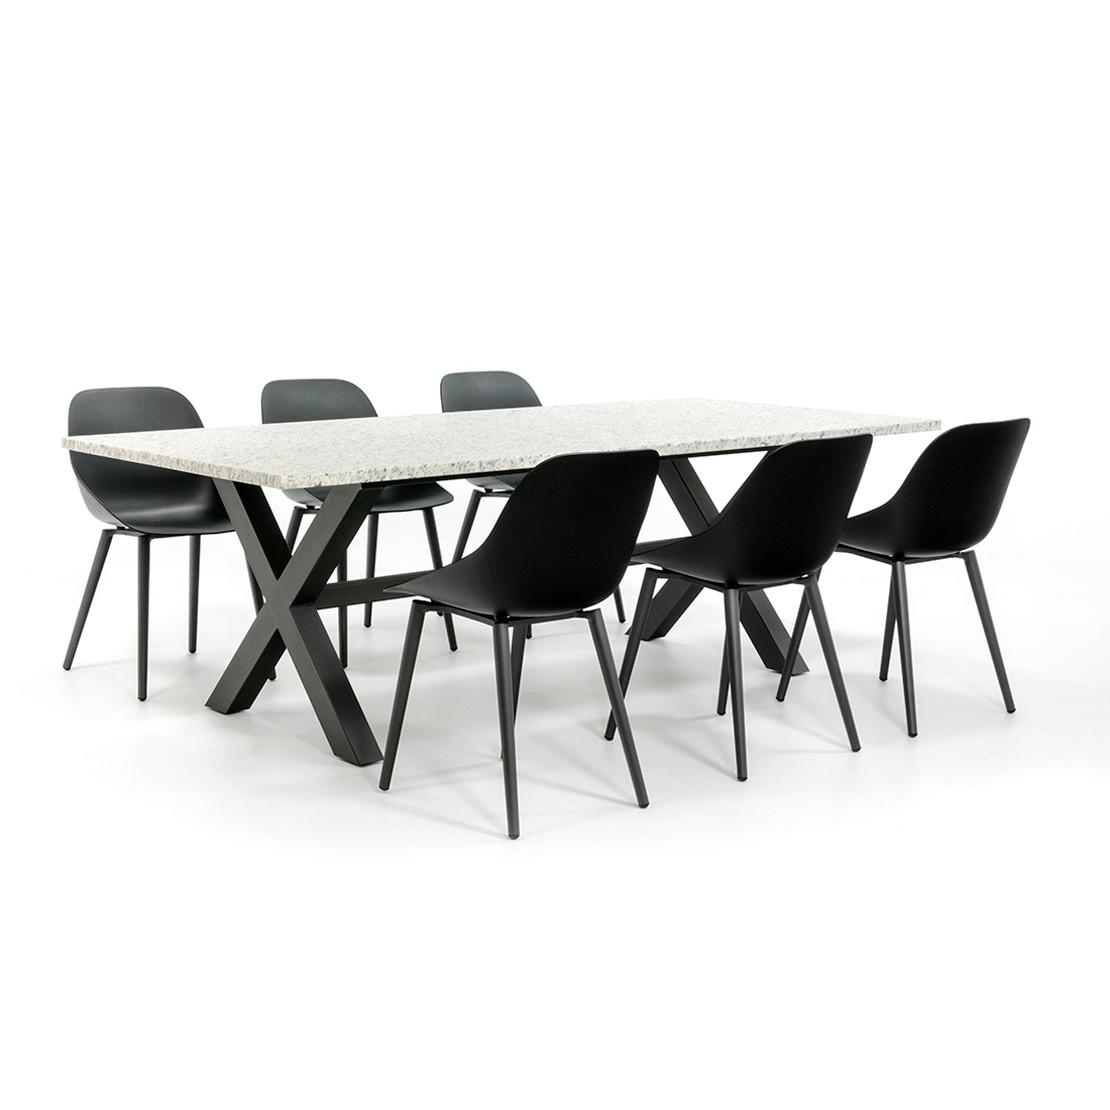 Industriële tuinset met moderne stoelen